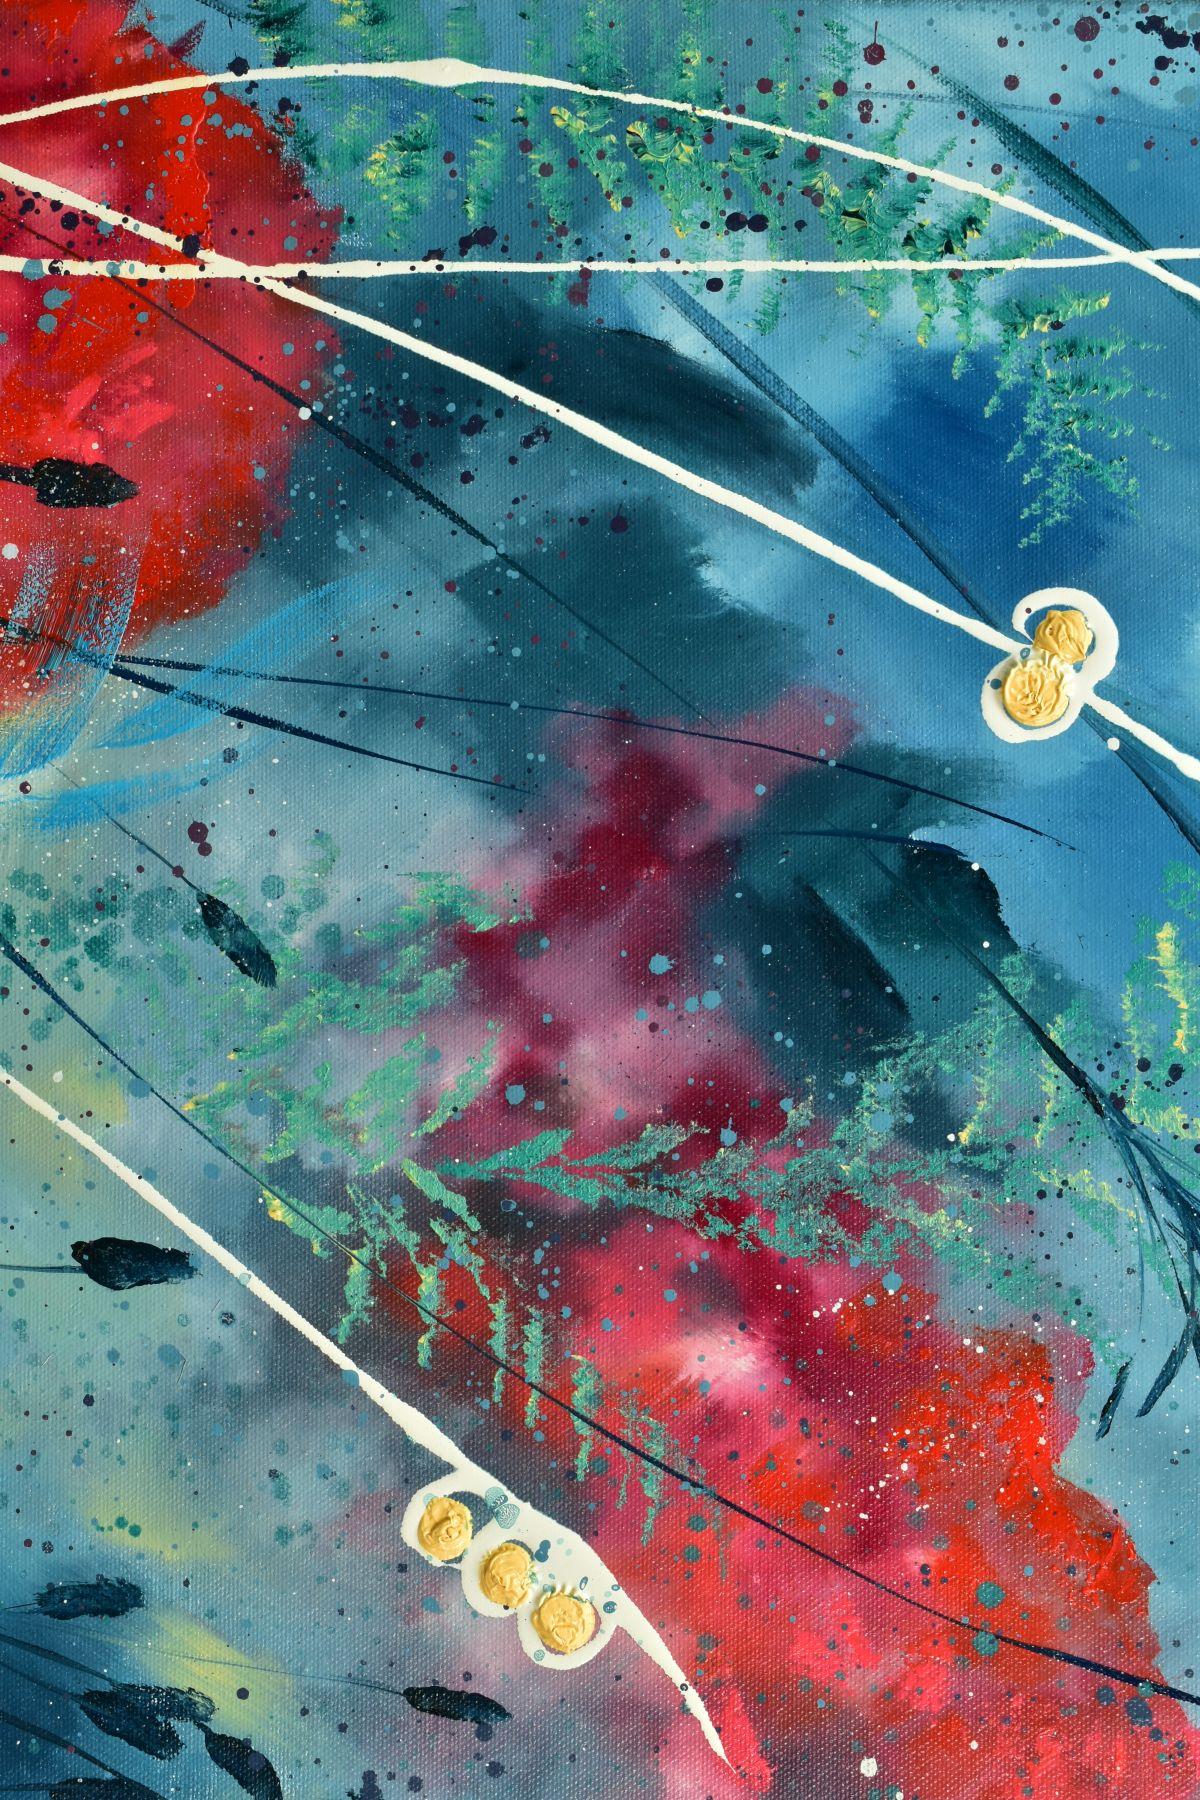 JULIE ANN SCOTT (BRITISH CONTEMPORARY), 'Home Spun Joy', wild flowers against a blue backdrop, - Image 3 of 7